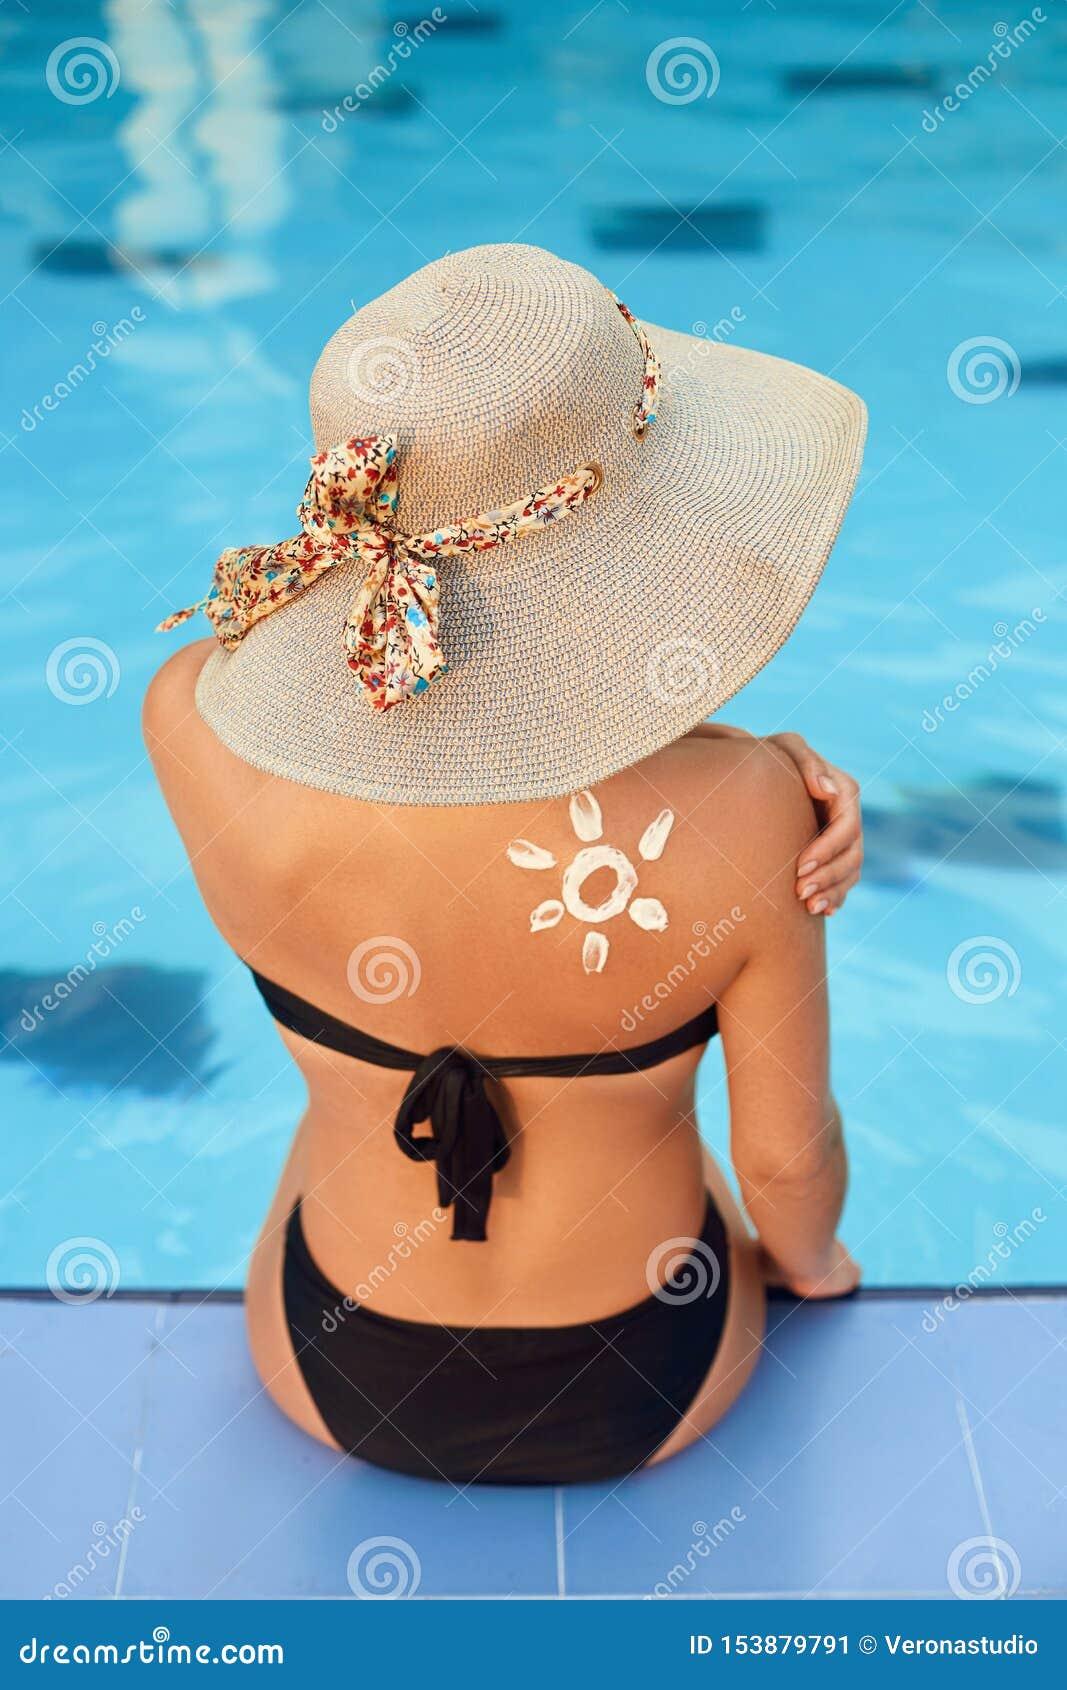 Sunscreen sunblock Γυναίκα που βάζει την ηλιακή κρέμα στον ώμο υπαίθρια από τη λίμνη κάτω από την ηλιοφάνεια την όμορφη θερινή ημ